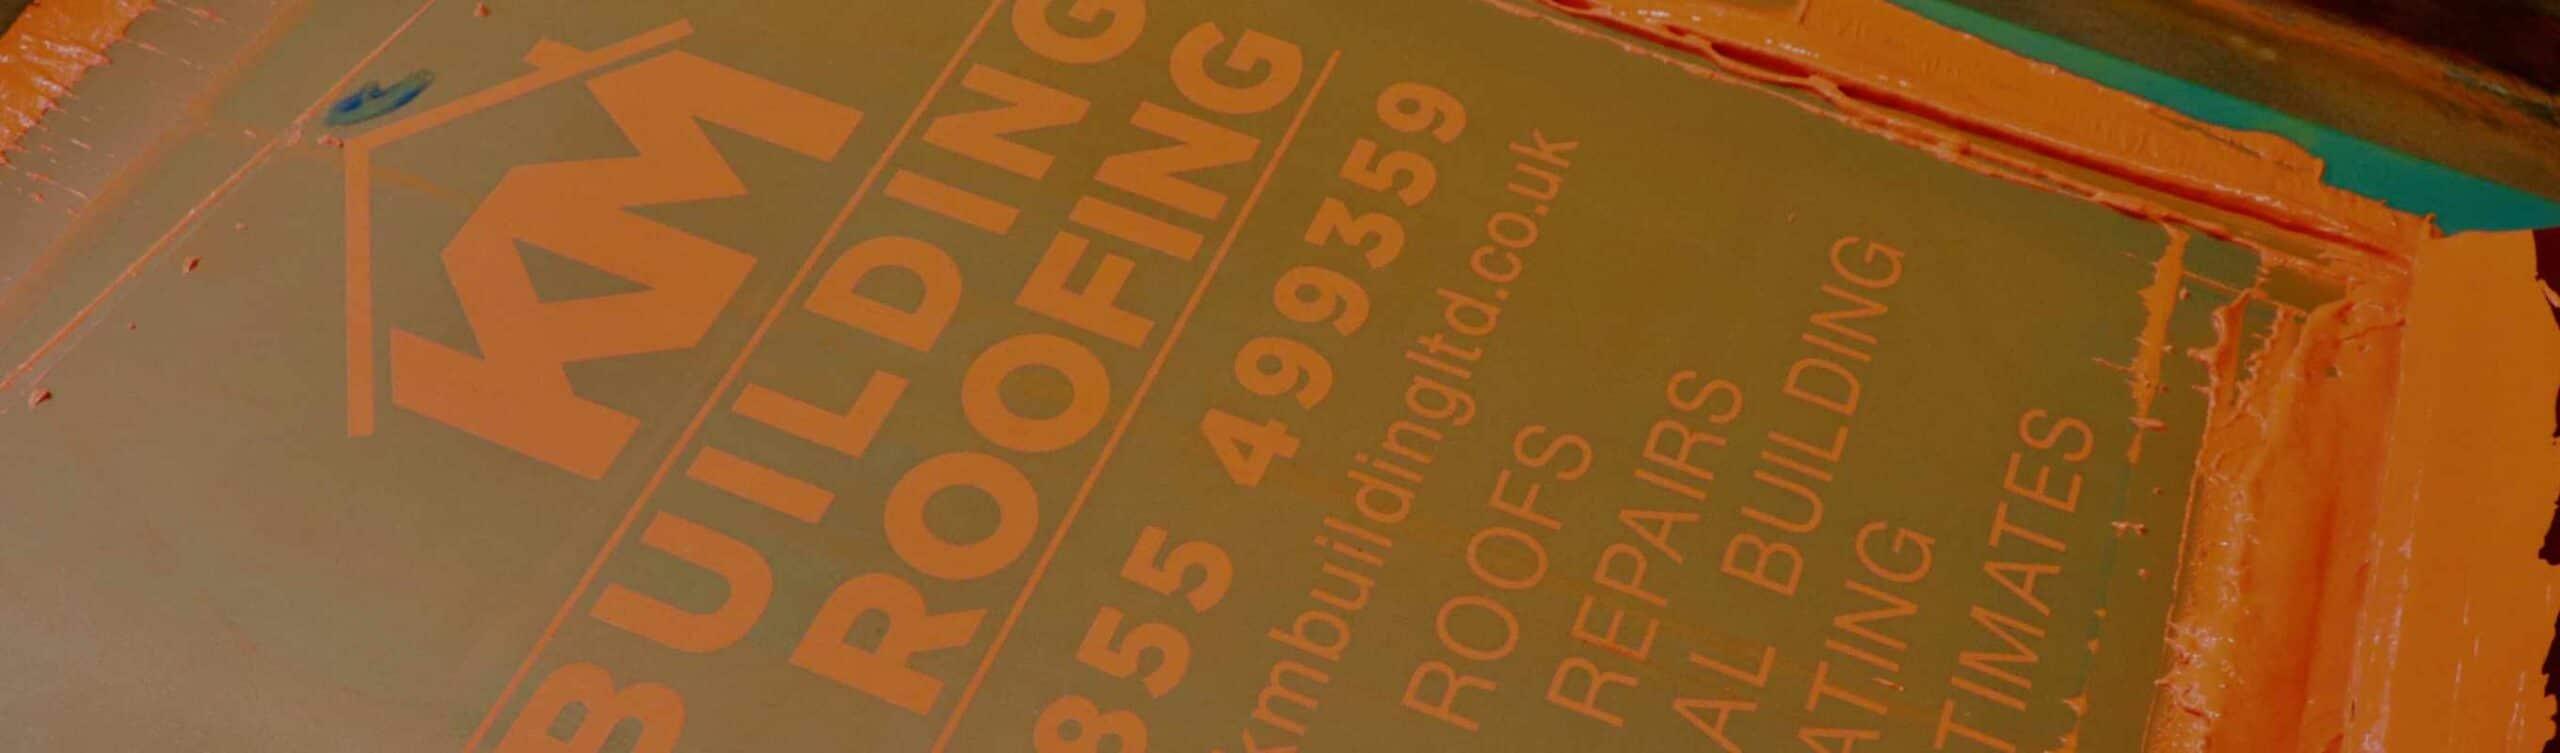 KM Building Roofing Screenprinting